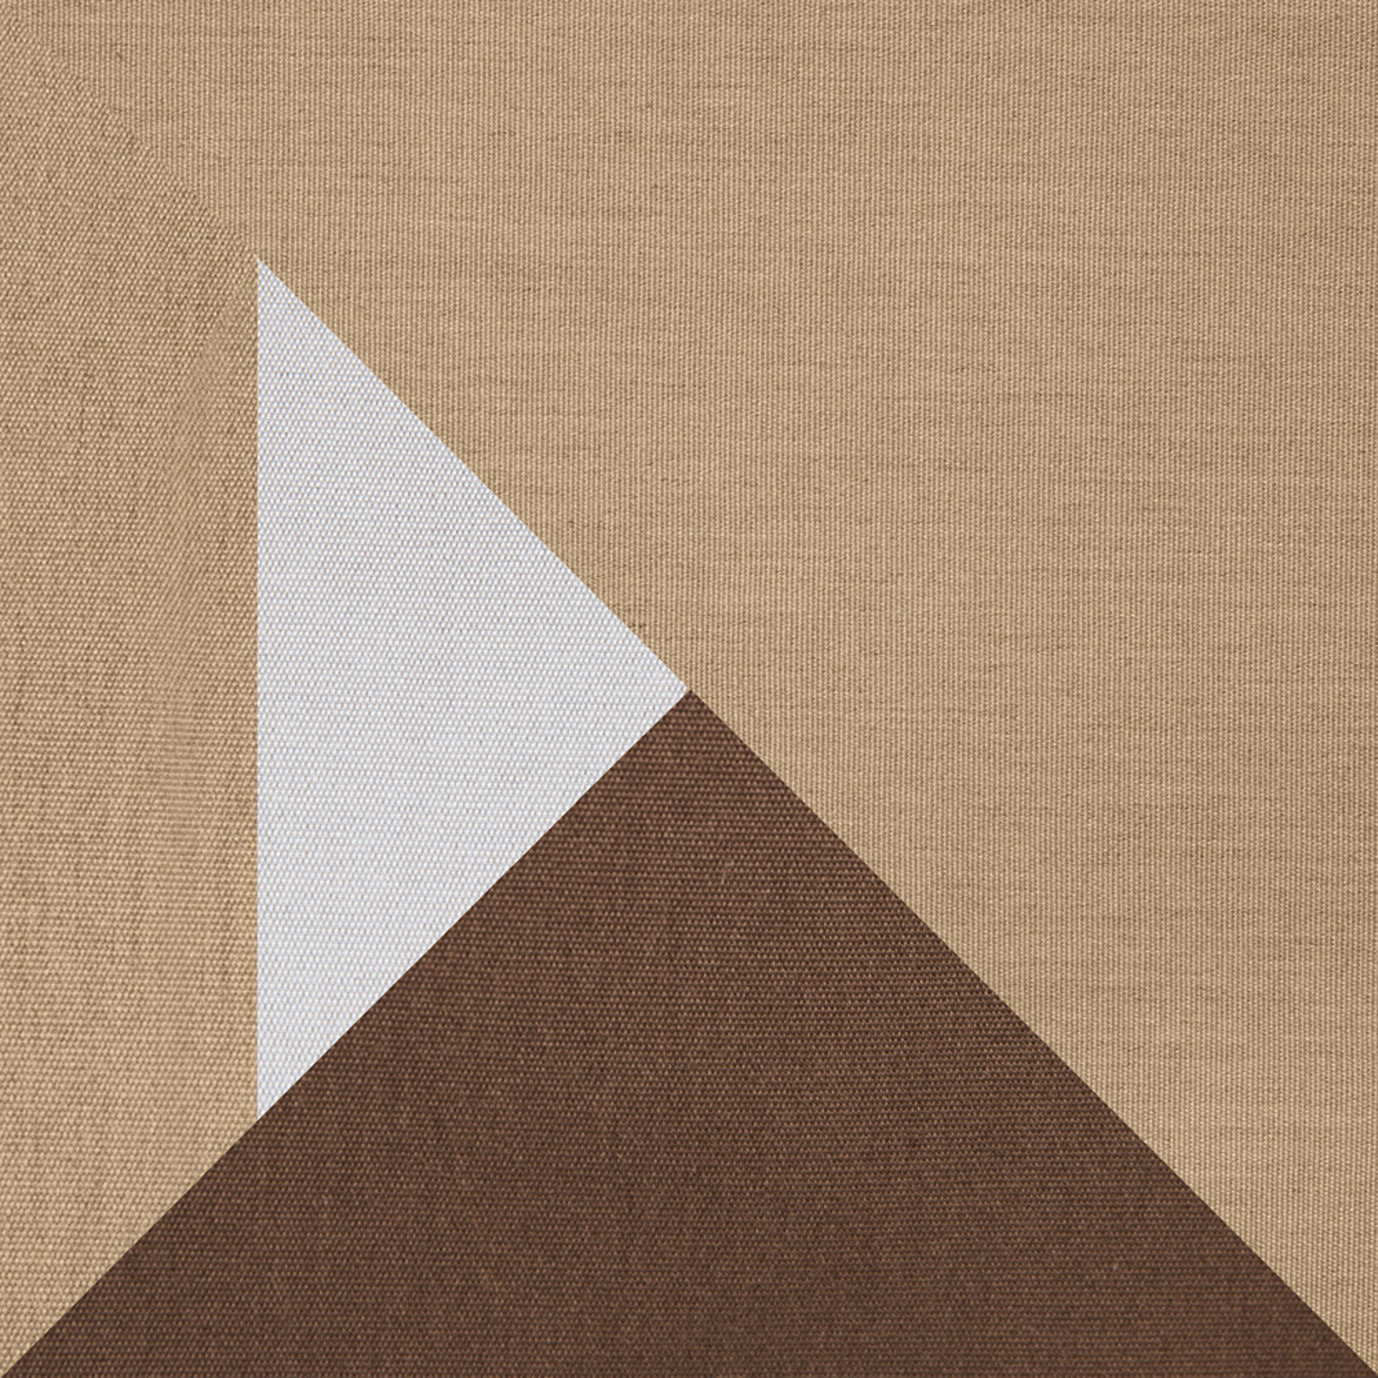 Milo™ Gray 6 Piece Sectional - Maxim Beige